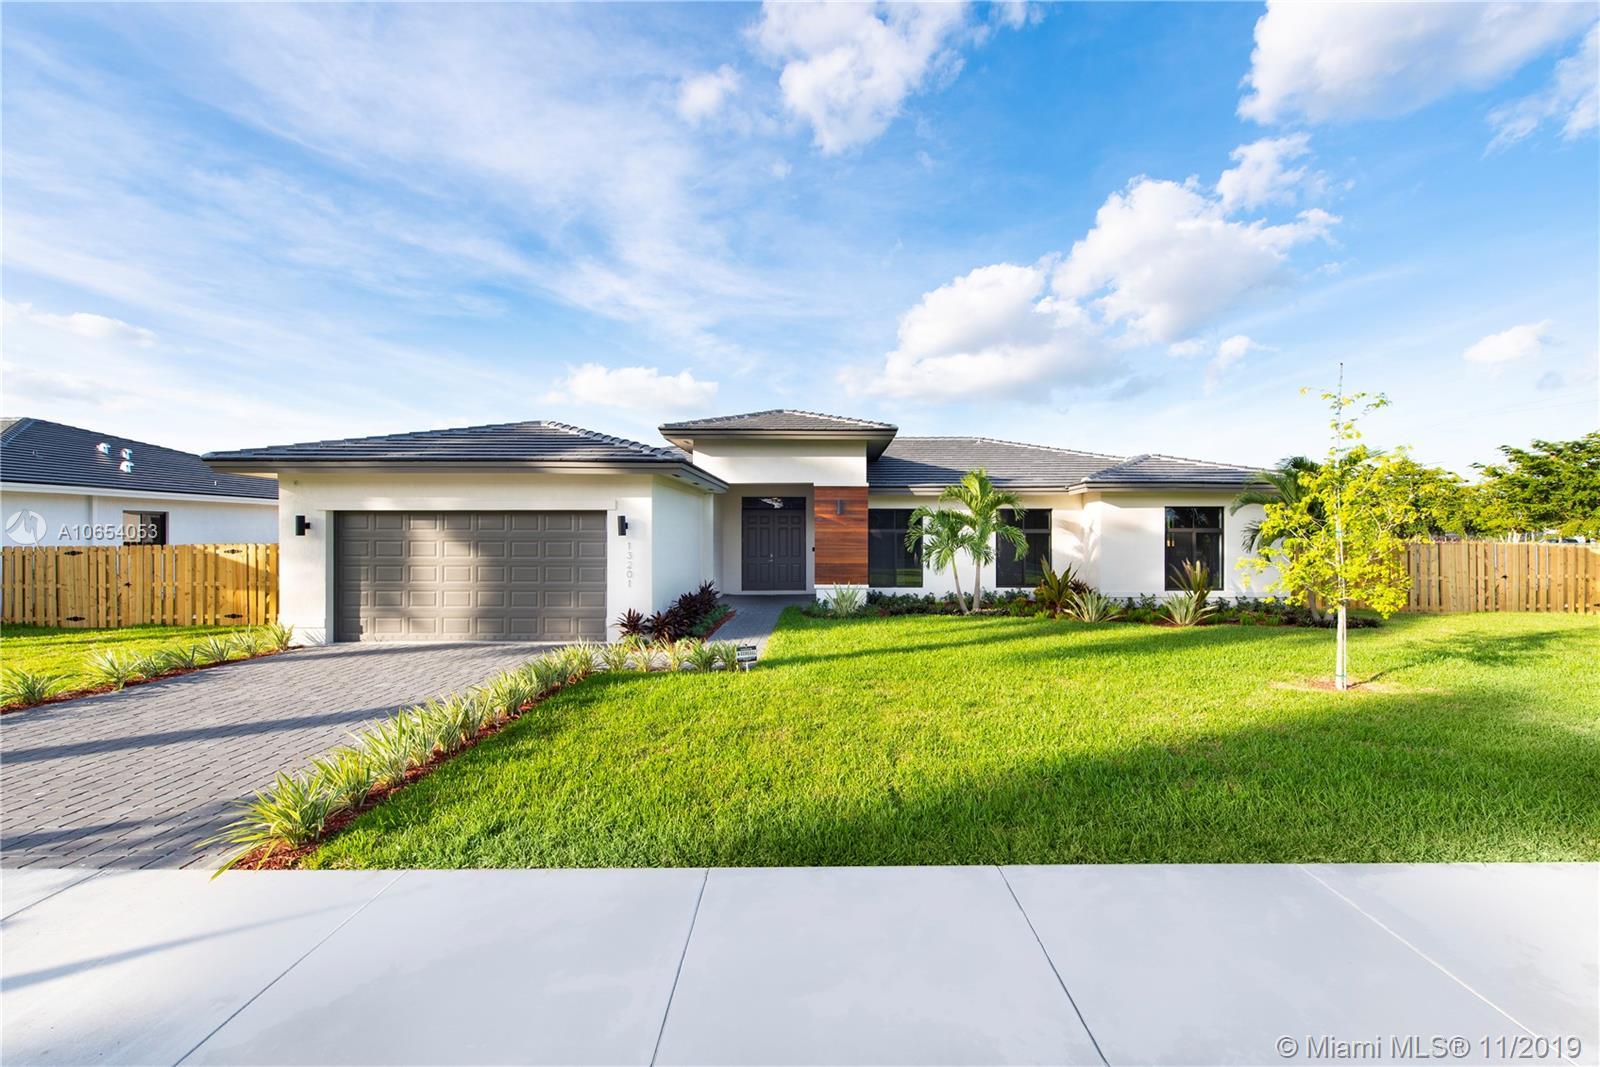 13201 SW 232 St, Homestead, FL 33170 - Homestead, FL real estate listing